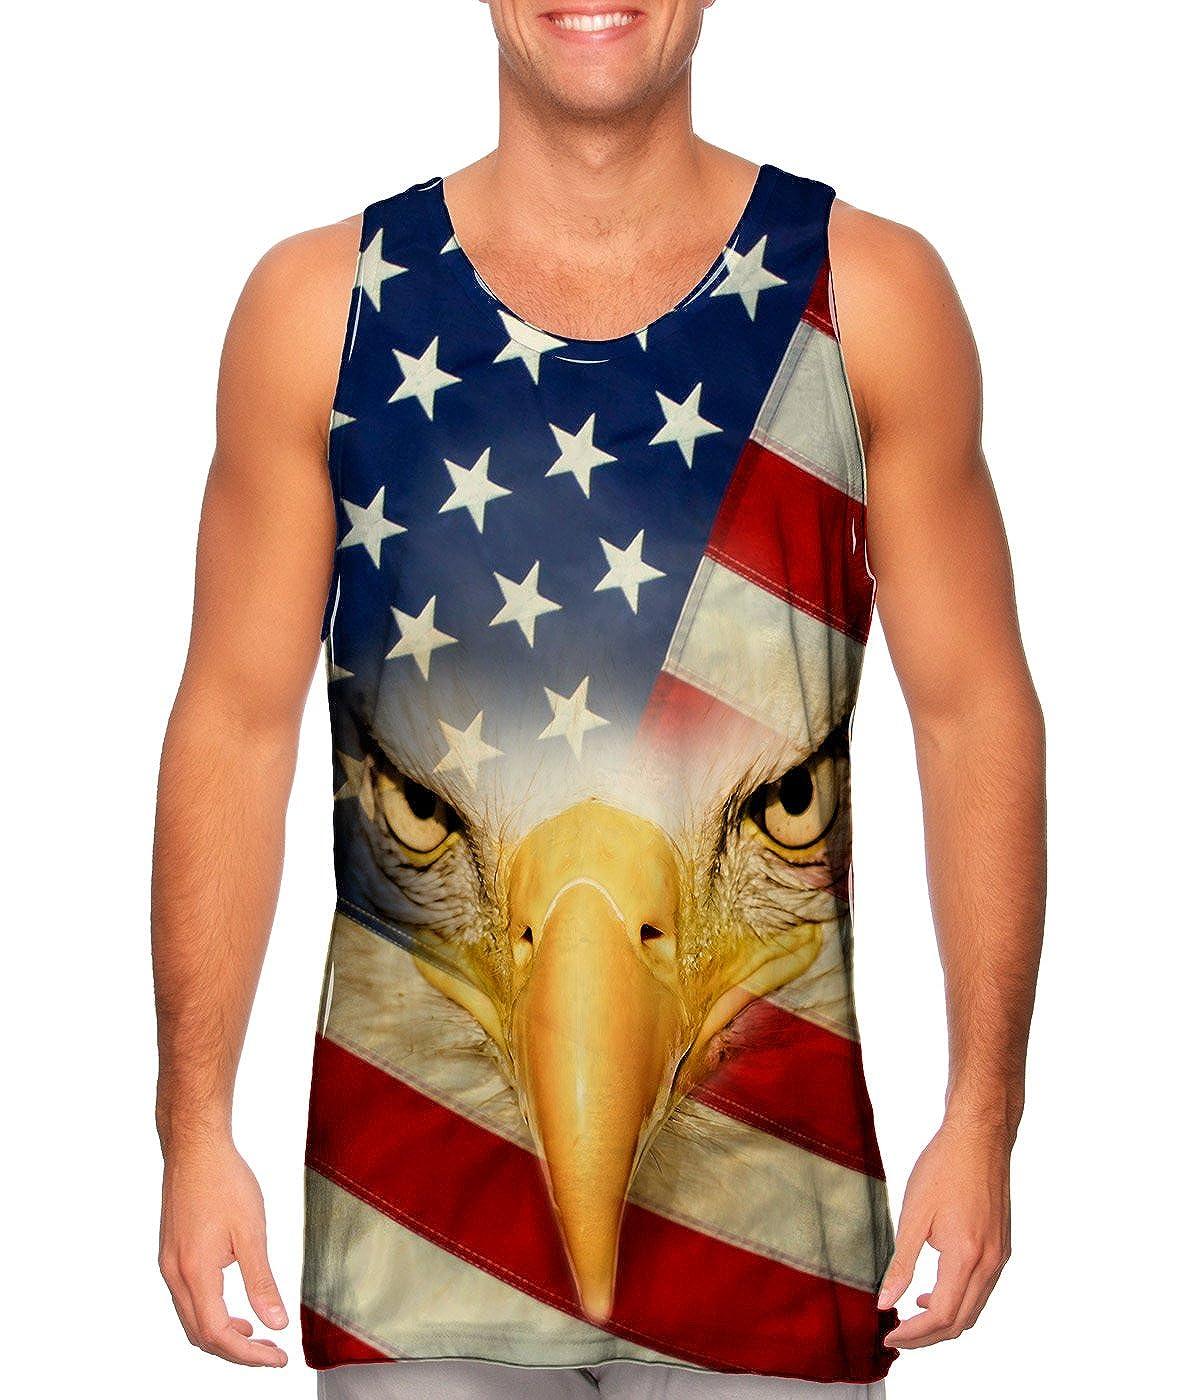 Yizzam animalshirtsusa- American Eagle - tshirt- para hombre tank ...